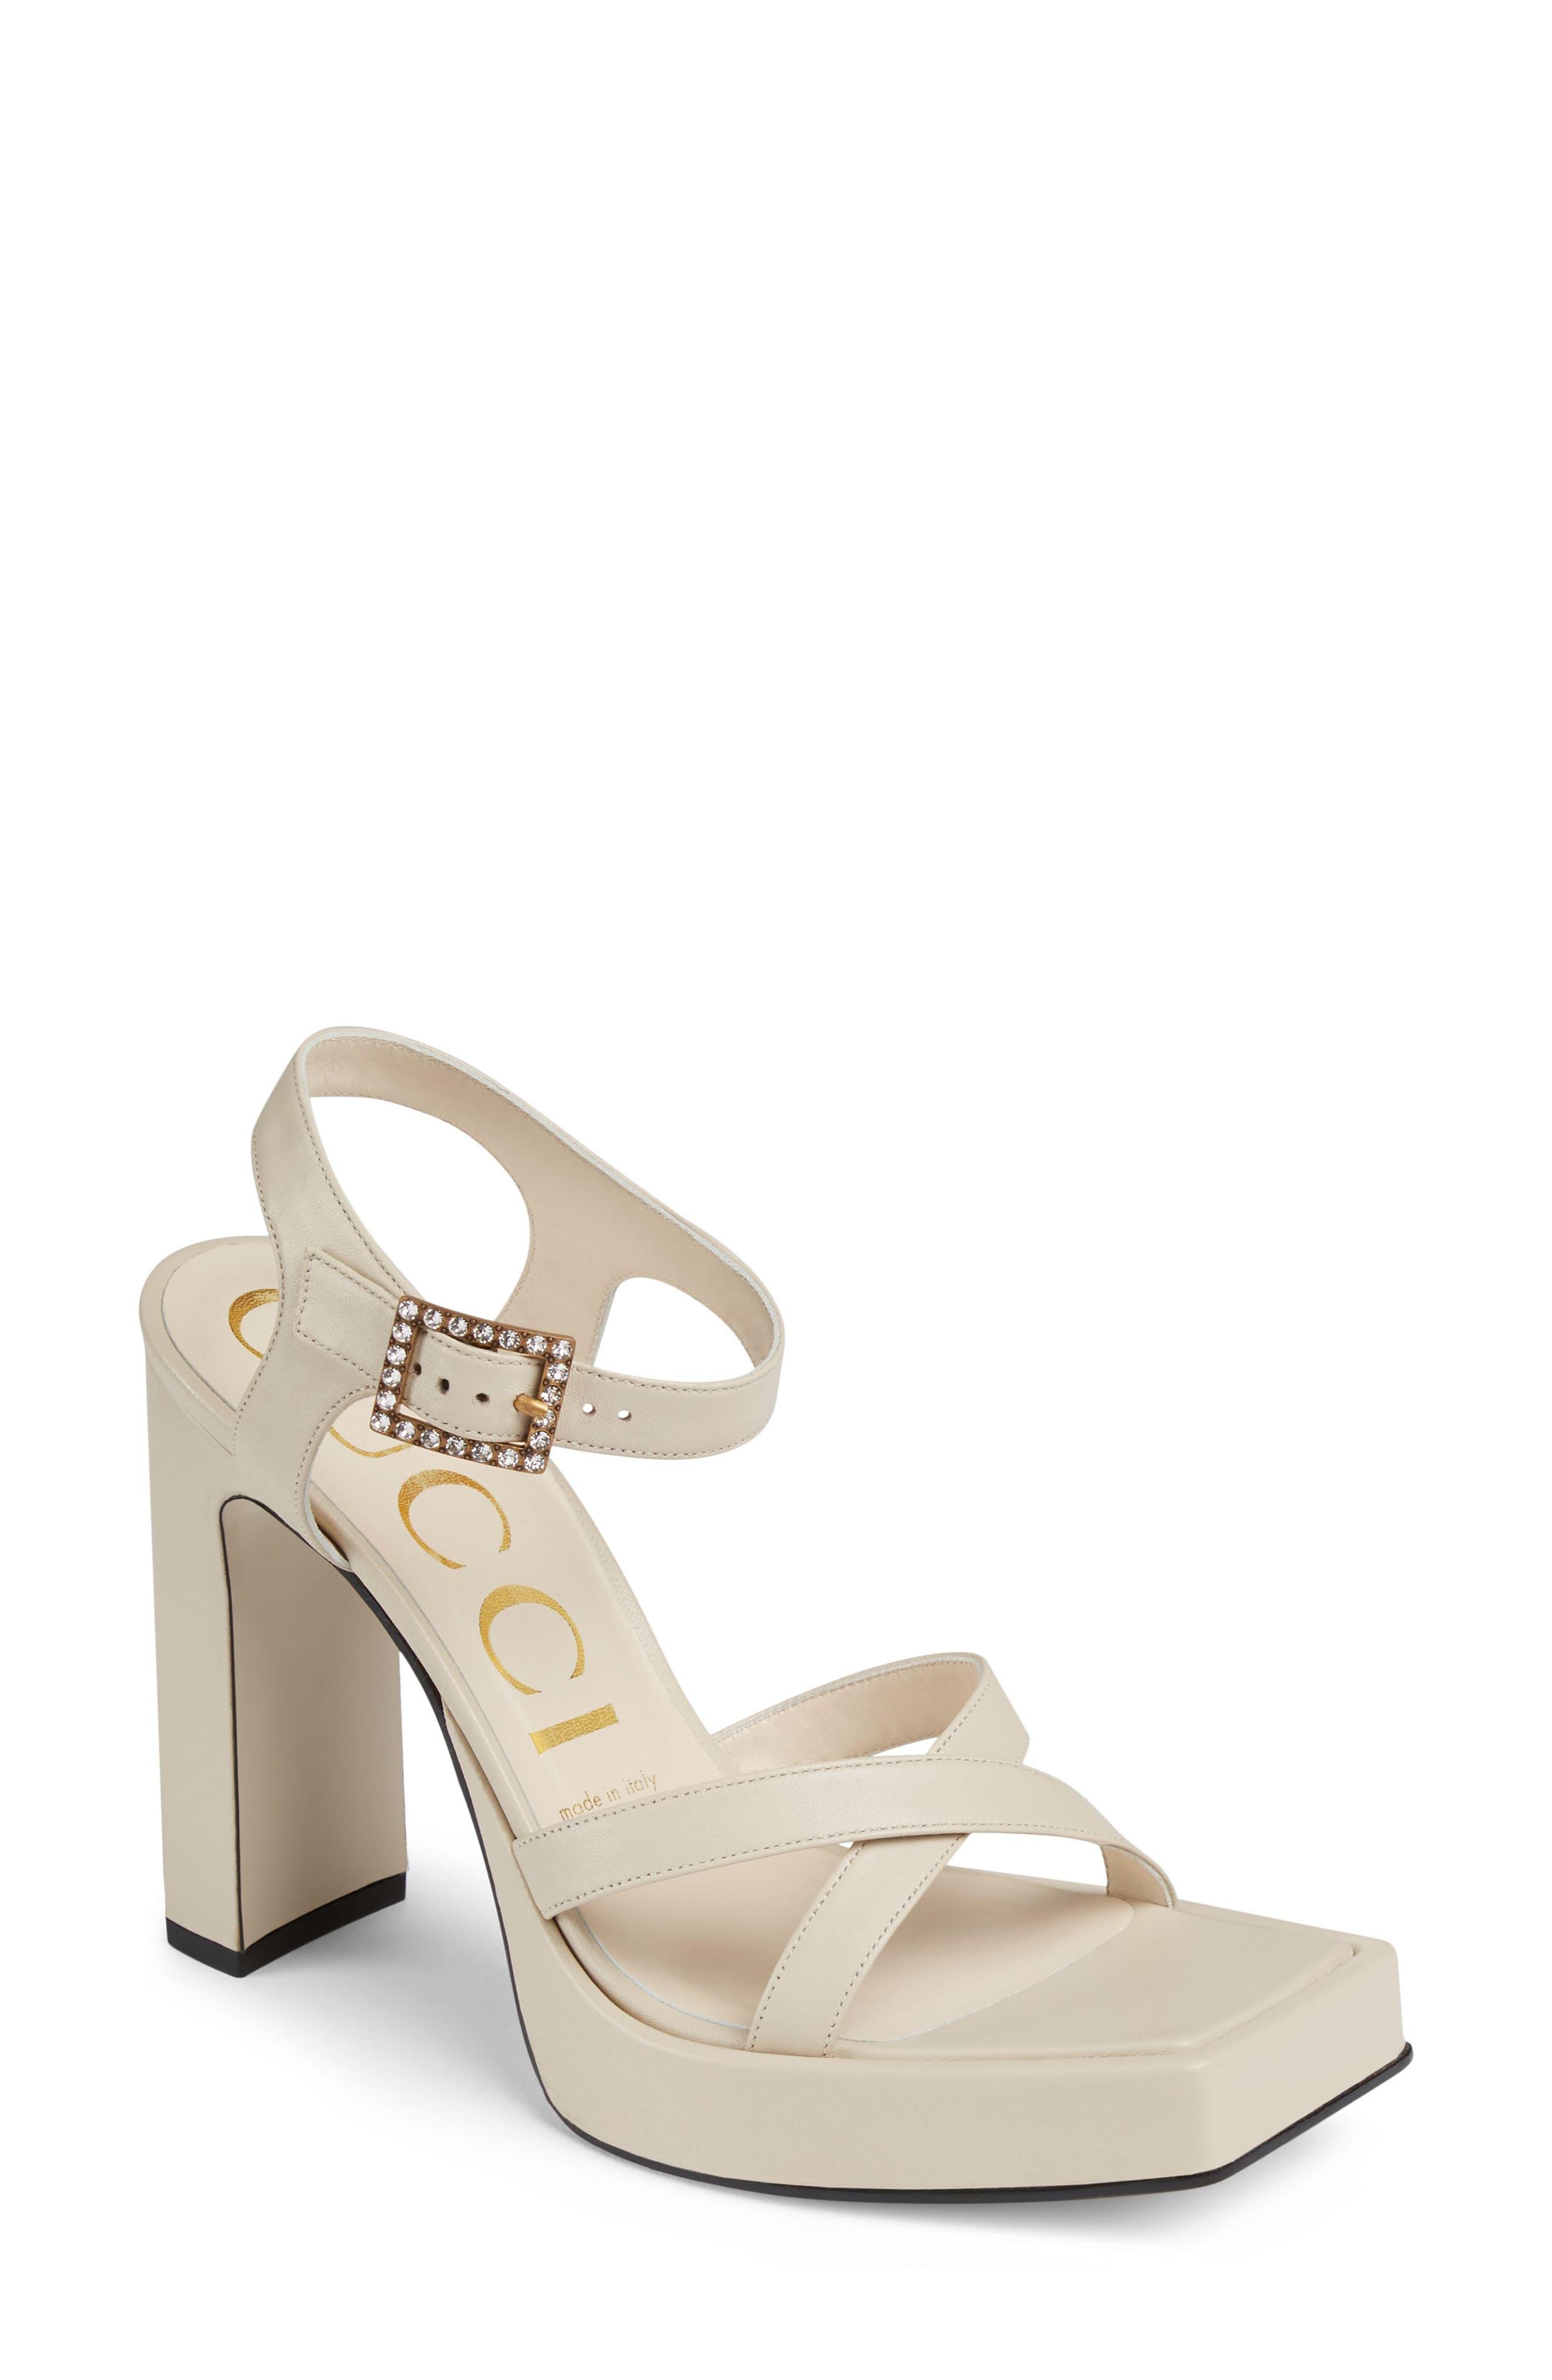 Costanze Platform Sandal,                             Main thumbnail 1, color,                             White